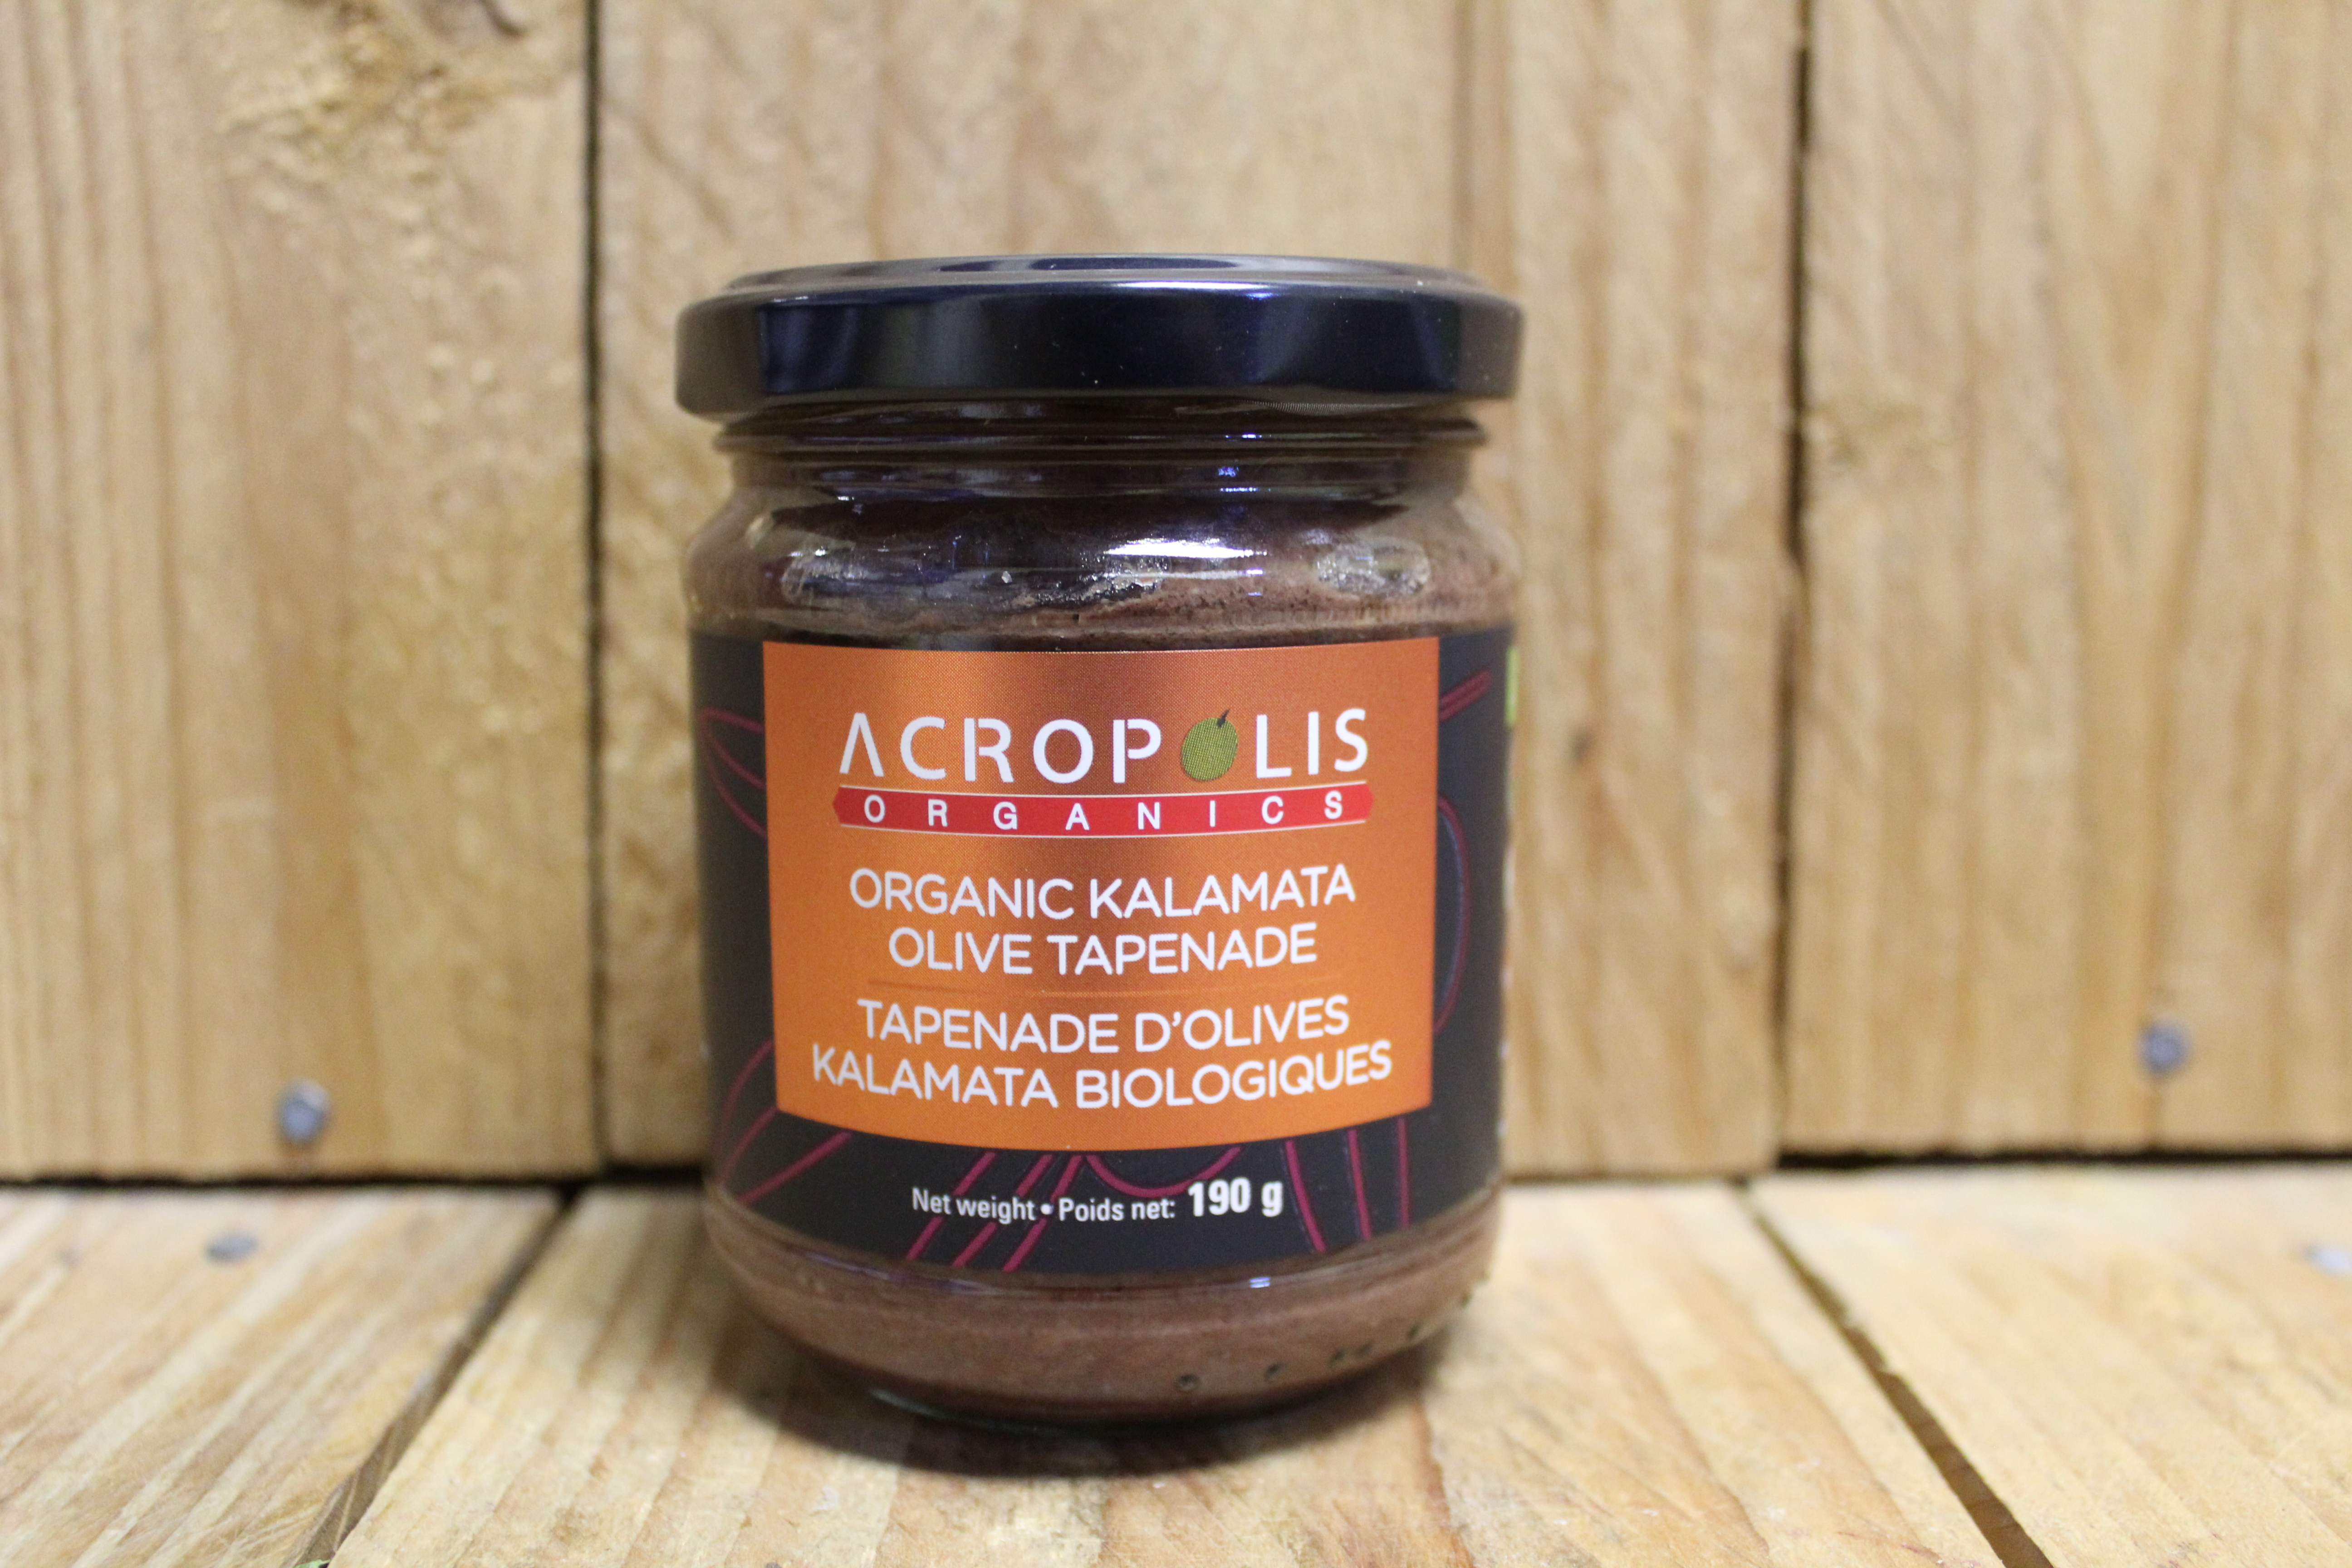 Acropolis – Organic Kalamata Olive Tapenade (190ml)